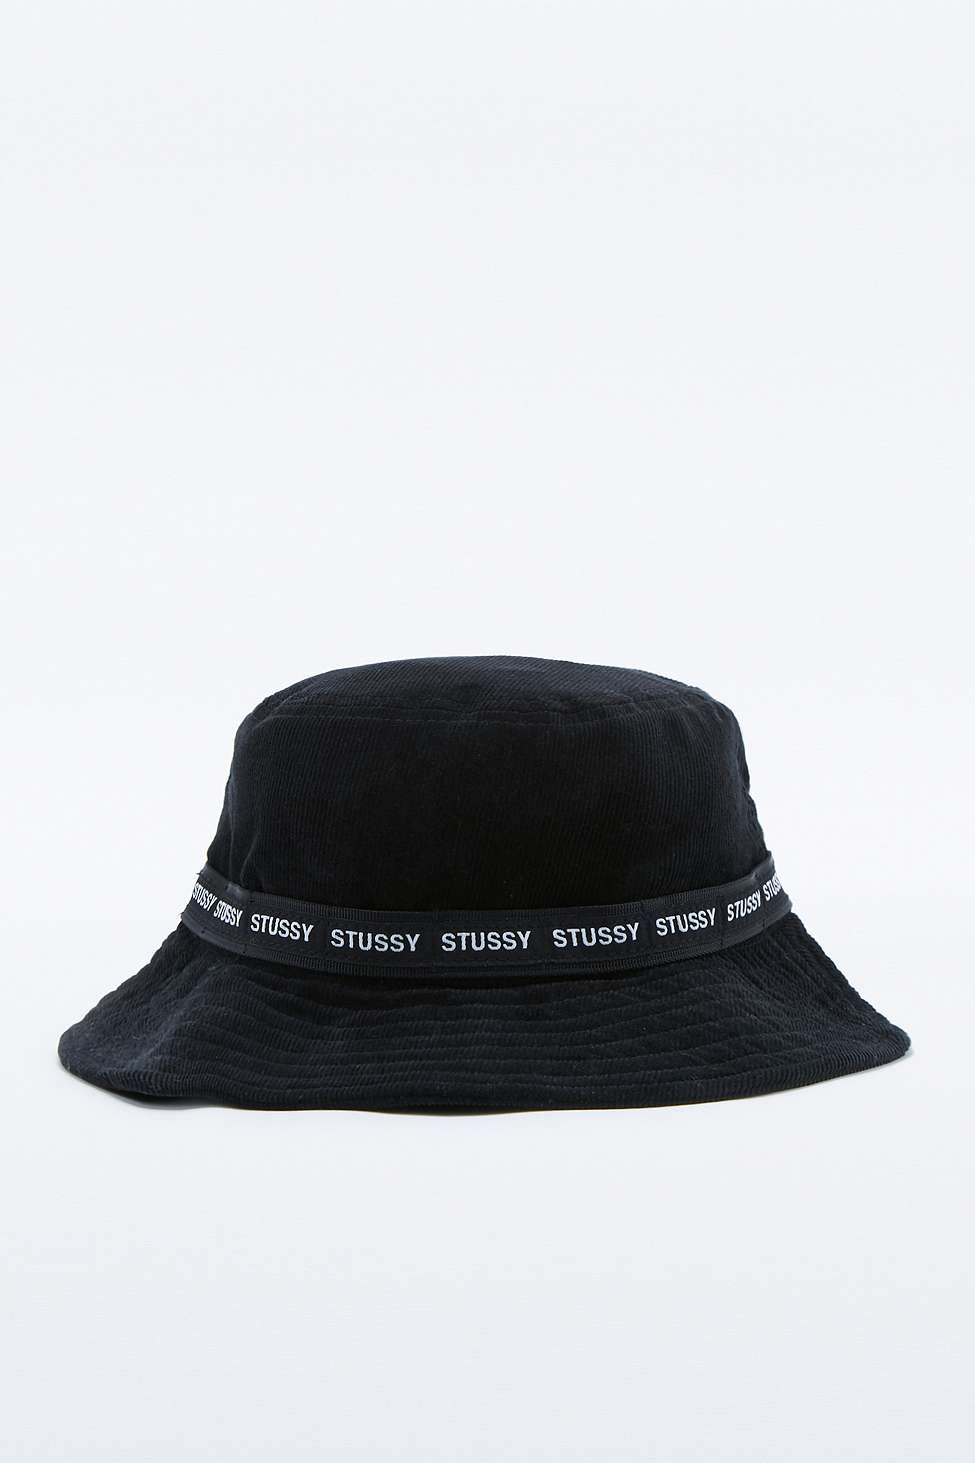 Stussy Black Corduroy Bucket Hat in Black for Men - Lyst a21bae47fb7f